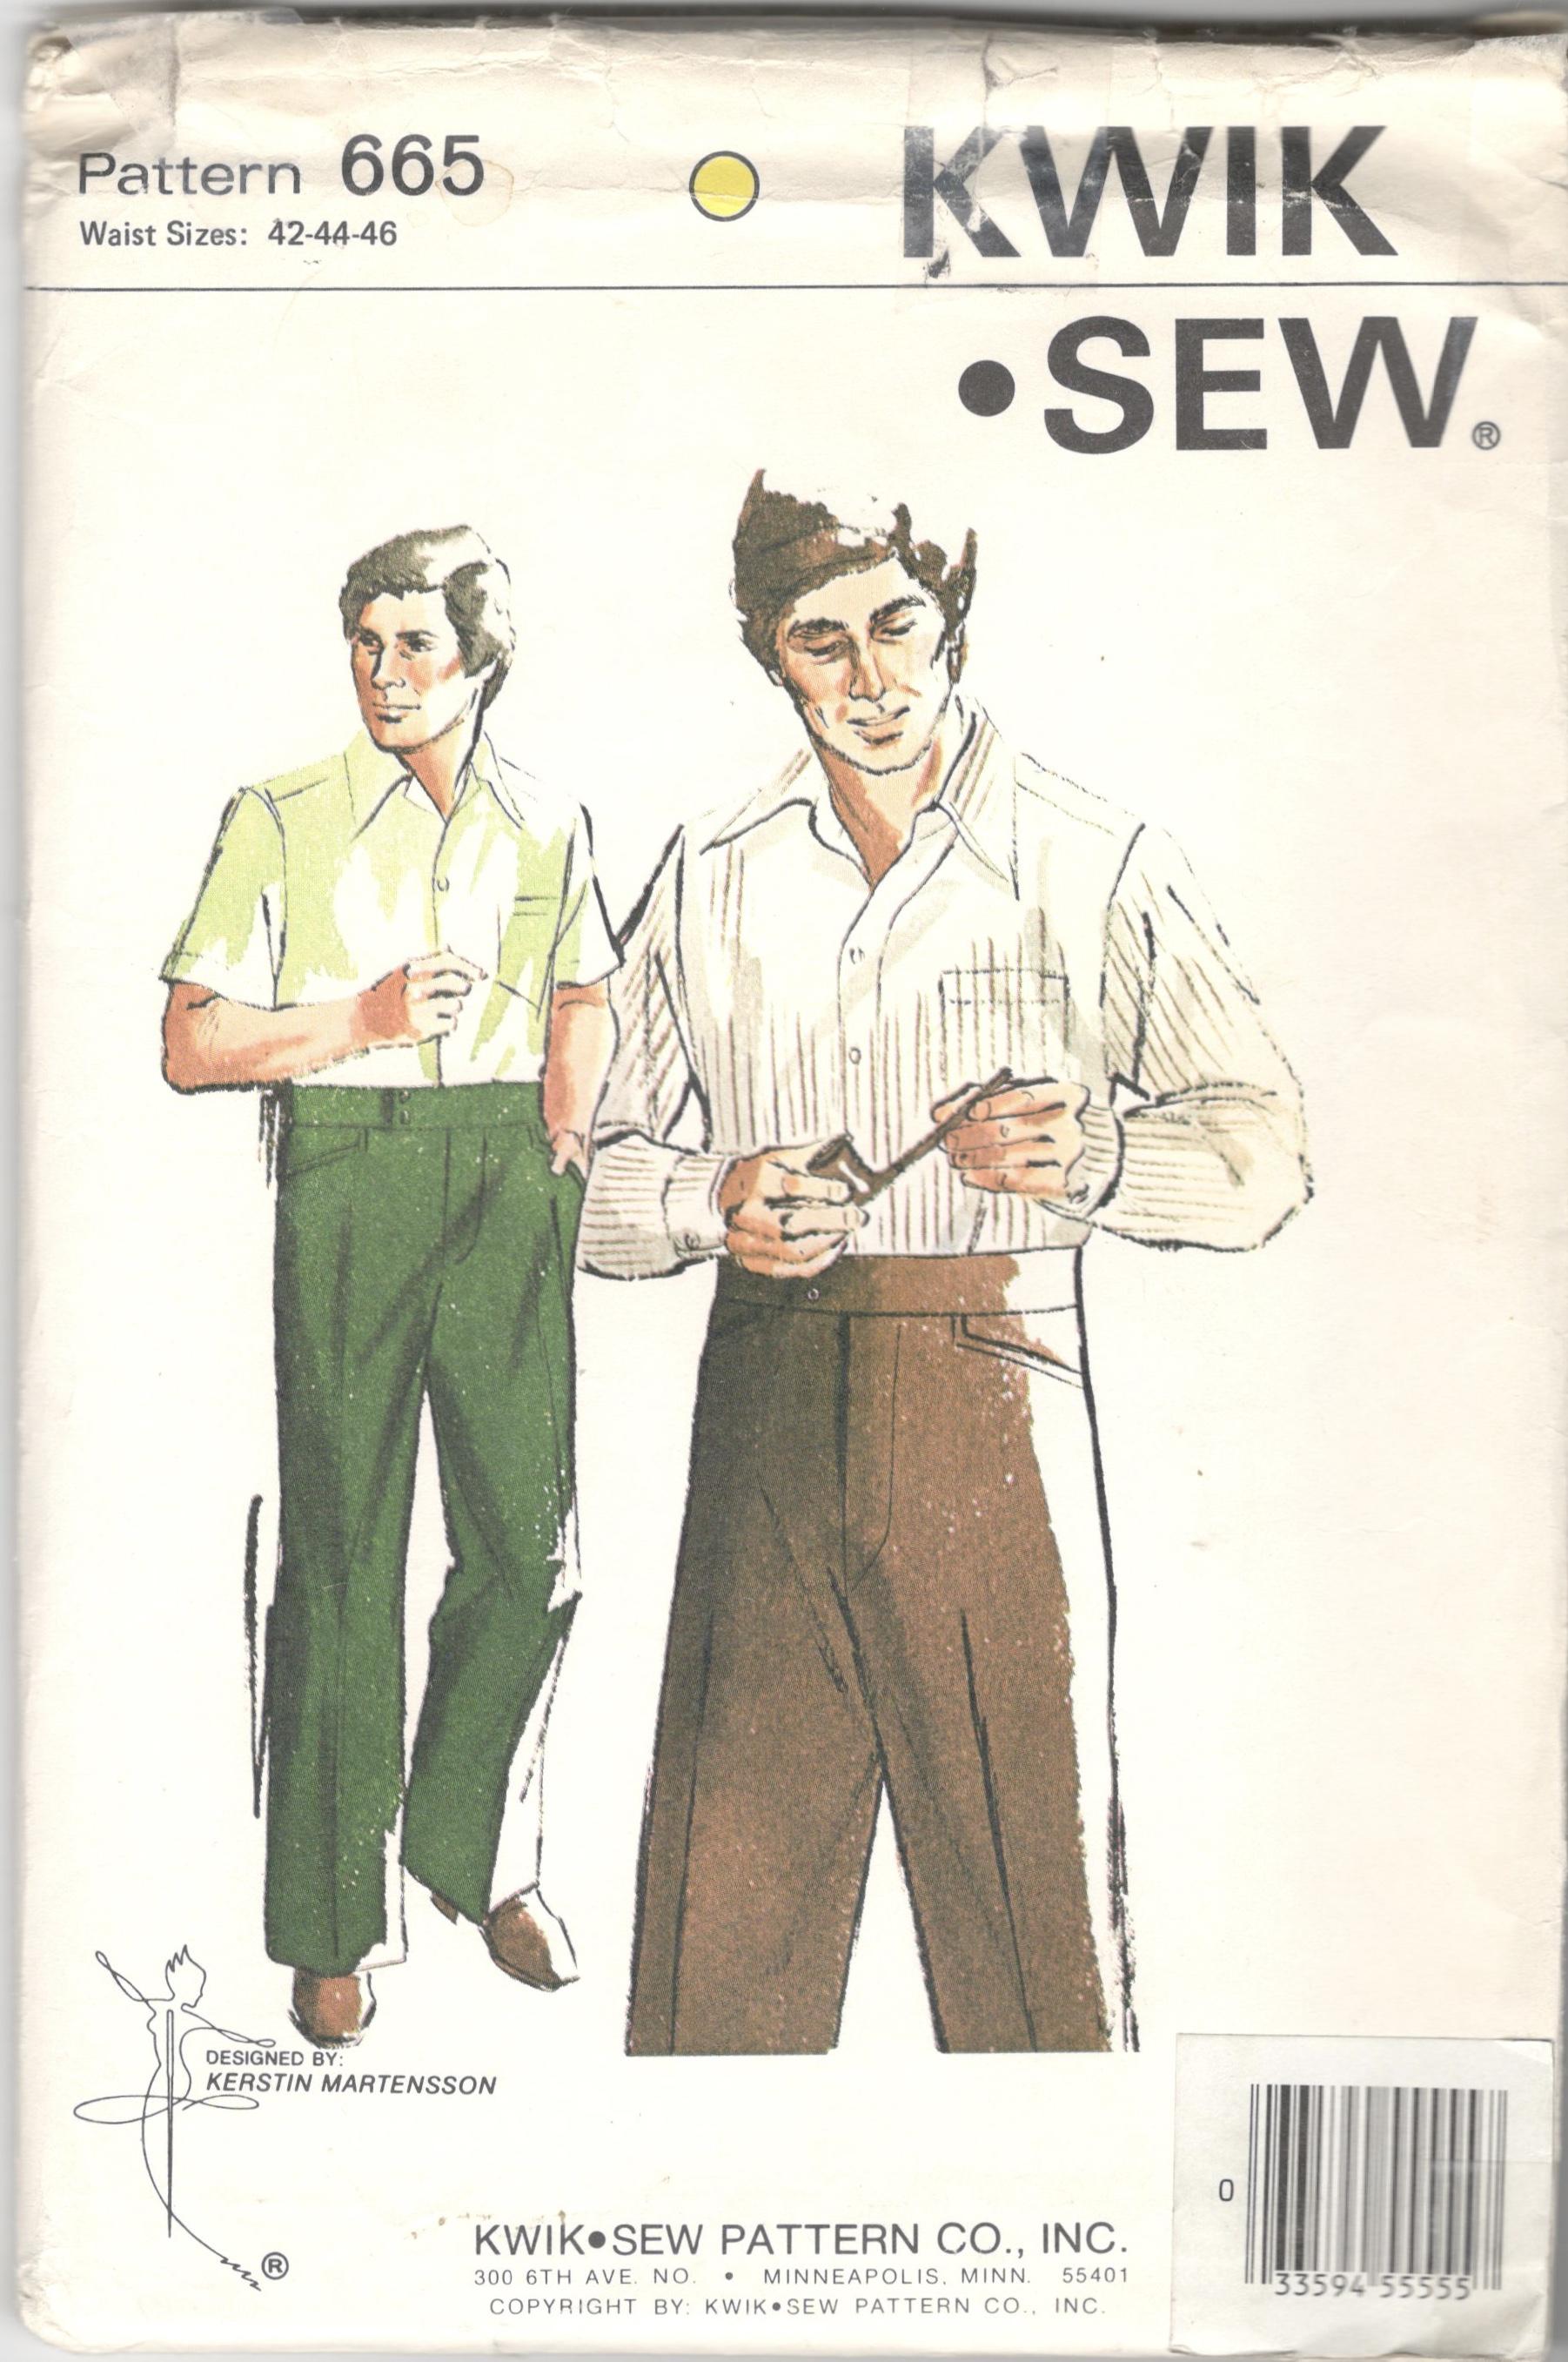 Kwik Sew 665 | Vintage Sewing Patterns | FANDOM powered by Wikia